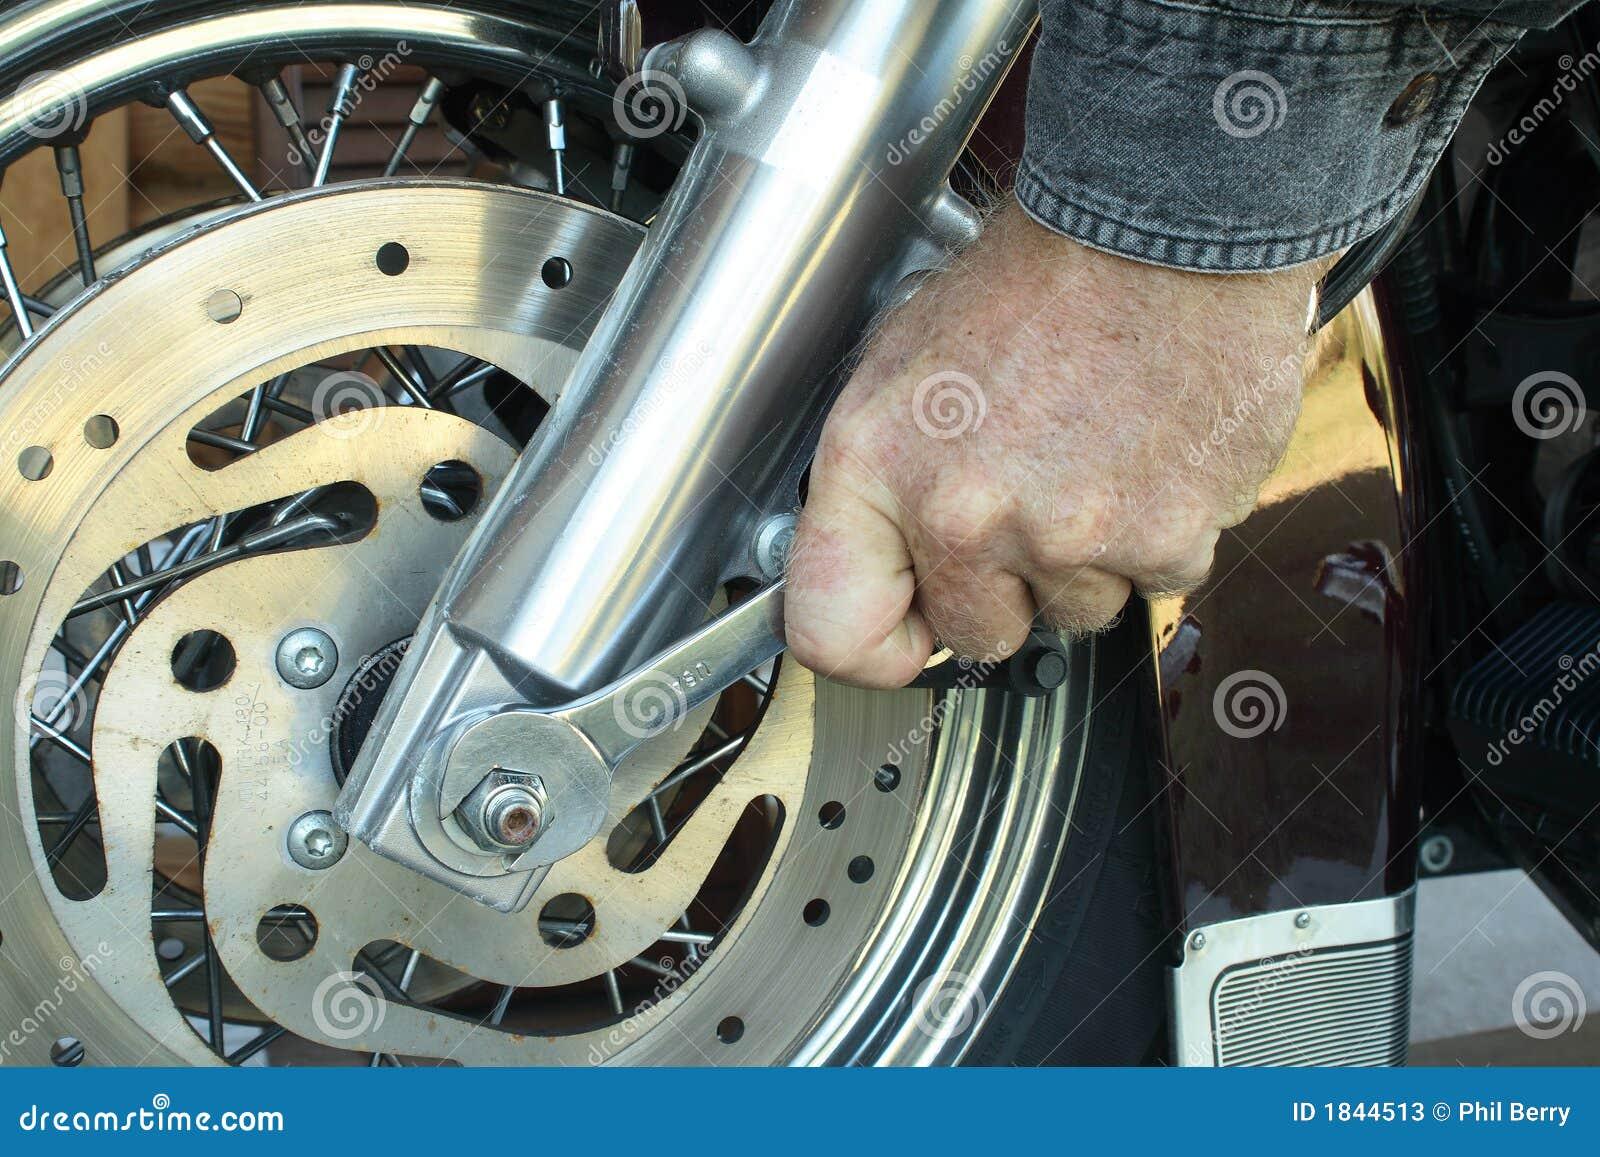 Motorcycle Mechanic Stock Photos Image 1844513